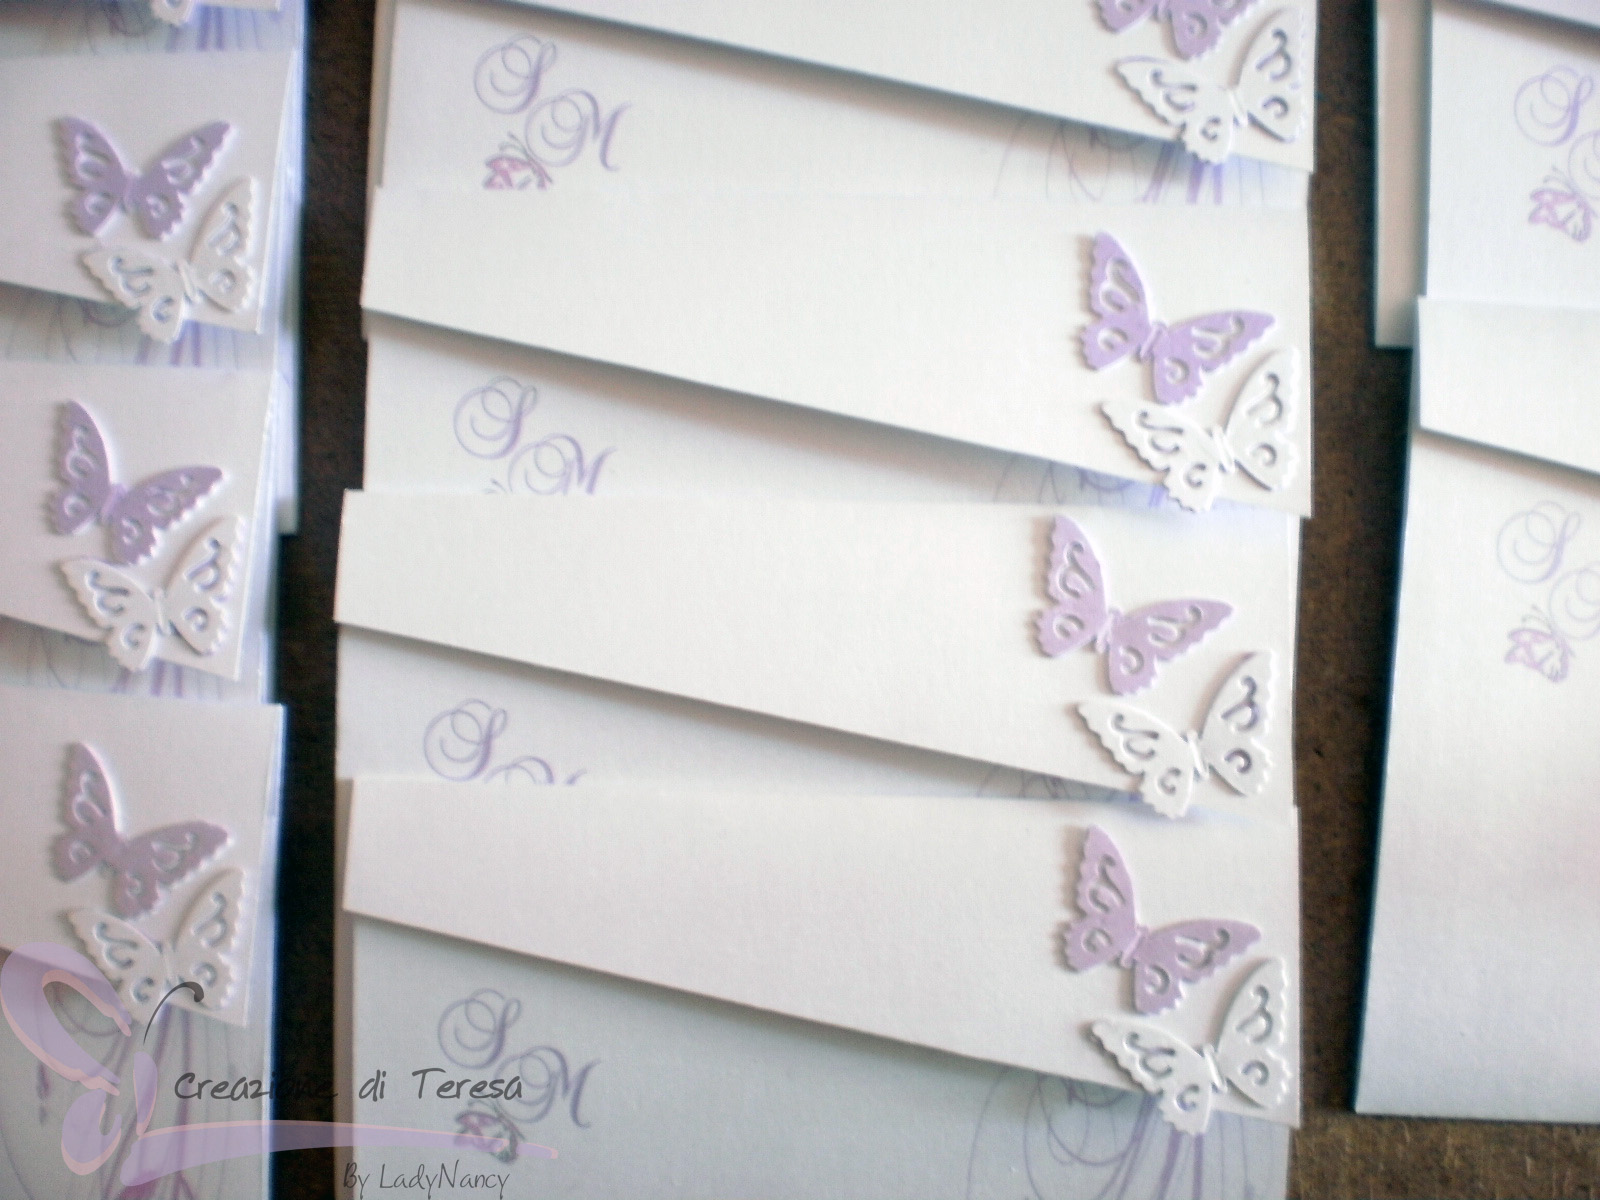 abbastanza Idee tema farfalle - Fai da te - Forum Matrimonio.com LD46